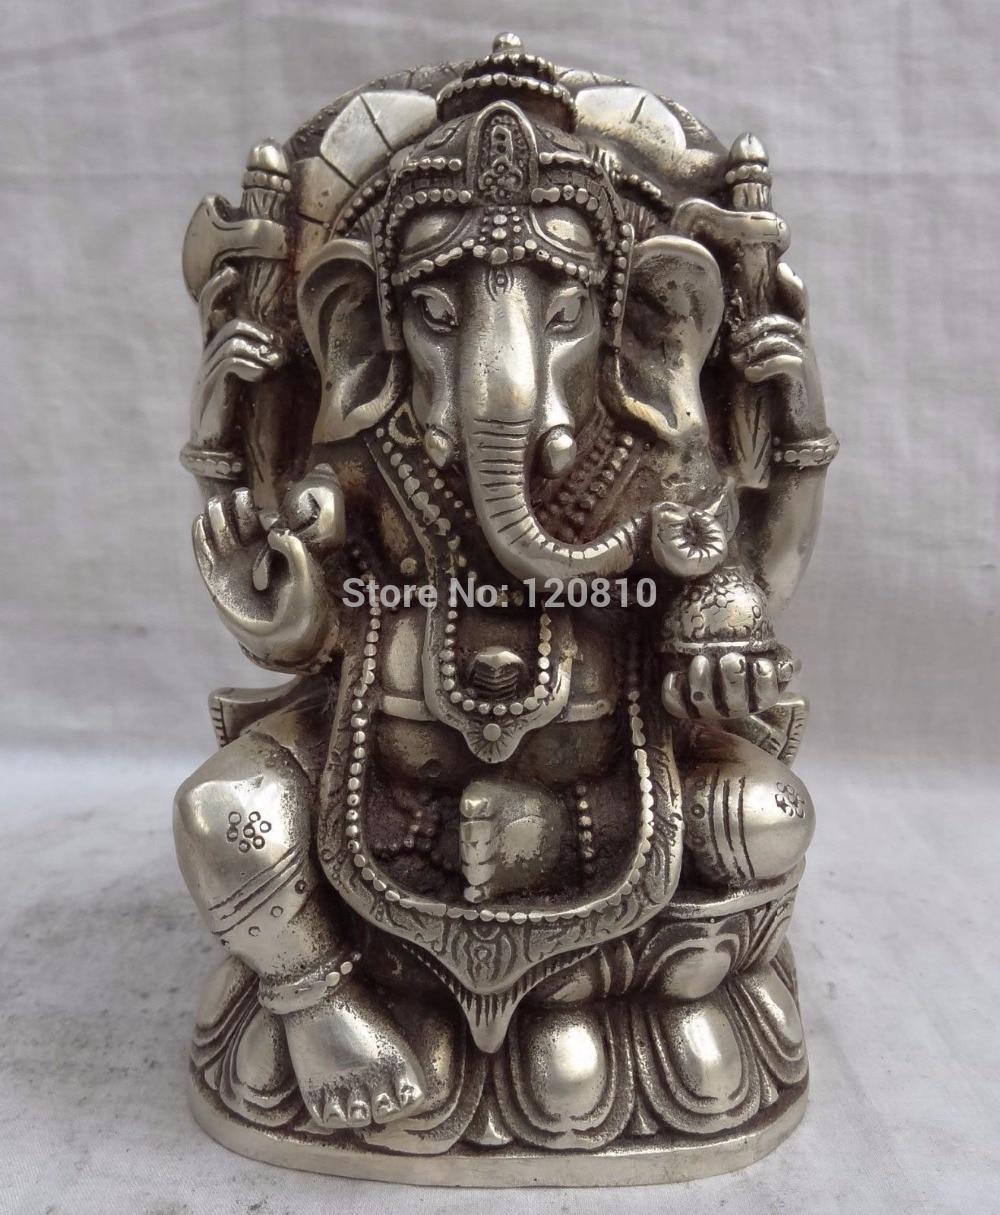 Zhaorui6600020 + + Tibet Argent Lotus 4 Bras Ganapati Ganesh Seigneur Ganesha Bouddha Souris Statue